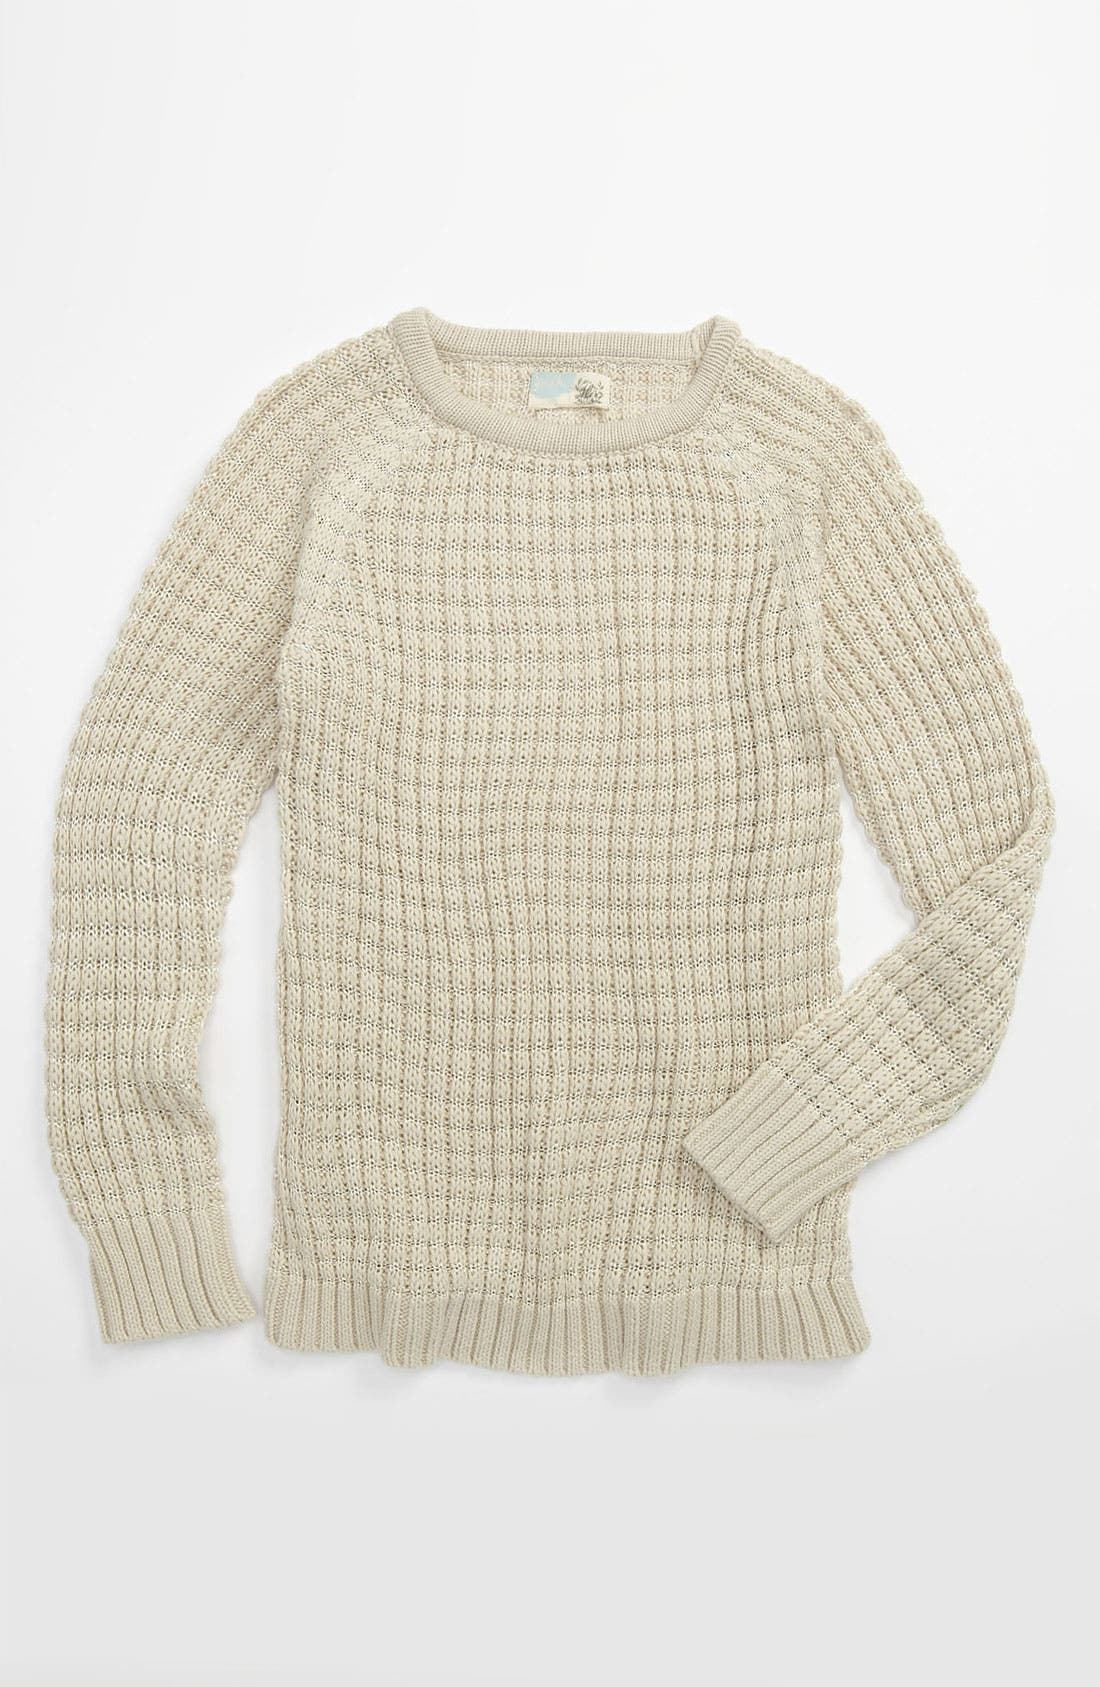 Alternate Image 1 Selected - Peek 'Tres' Sparkle Knit Crewneck Sweater (Toddler, Little Girls & Big Girls)